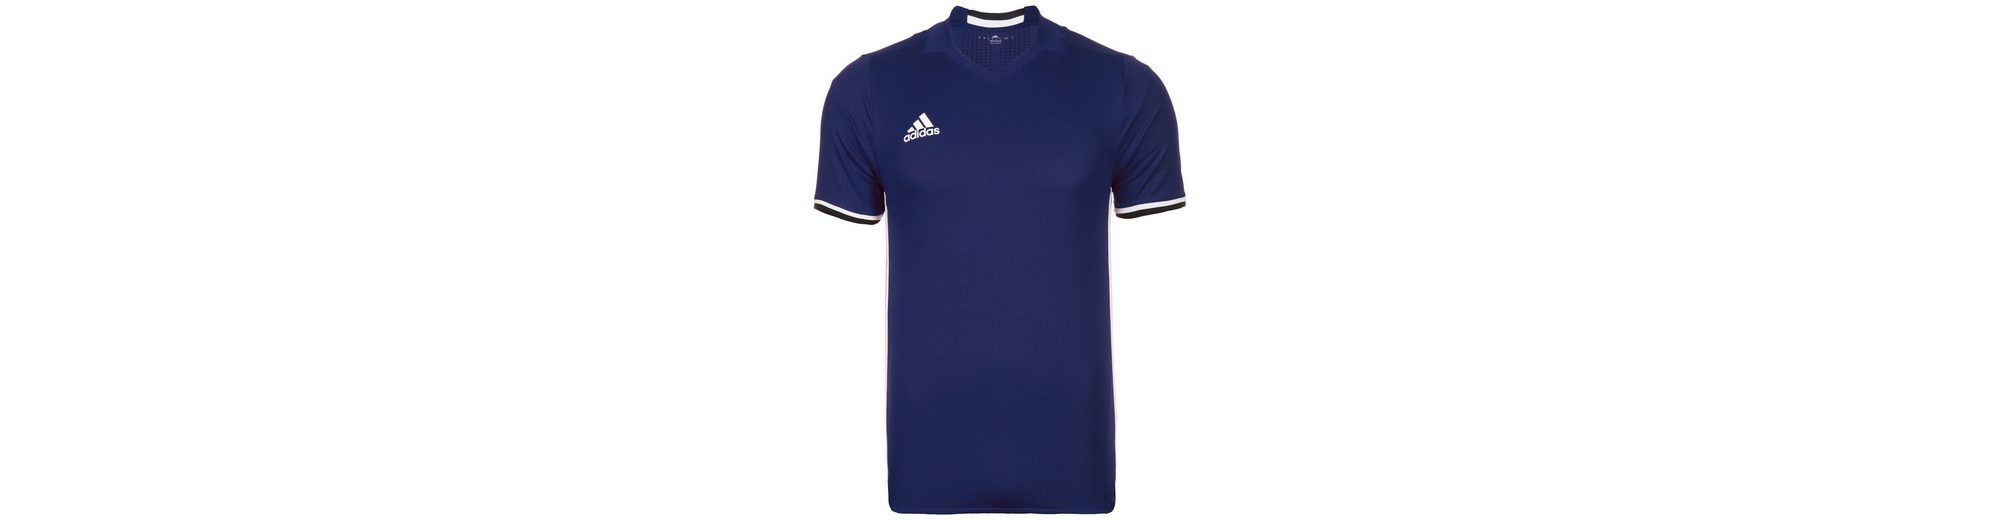 adidas Performance Condivo 16 Fußballtrikot Herren Billig Ausverkauf Limit Rabatt Freies Verschiffen Fälschung Billige Echte D9kfi